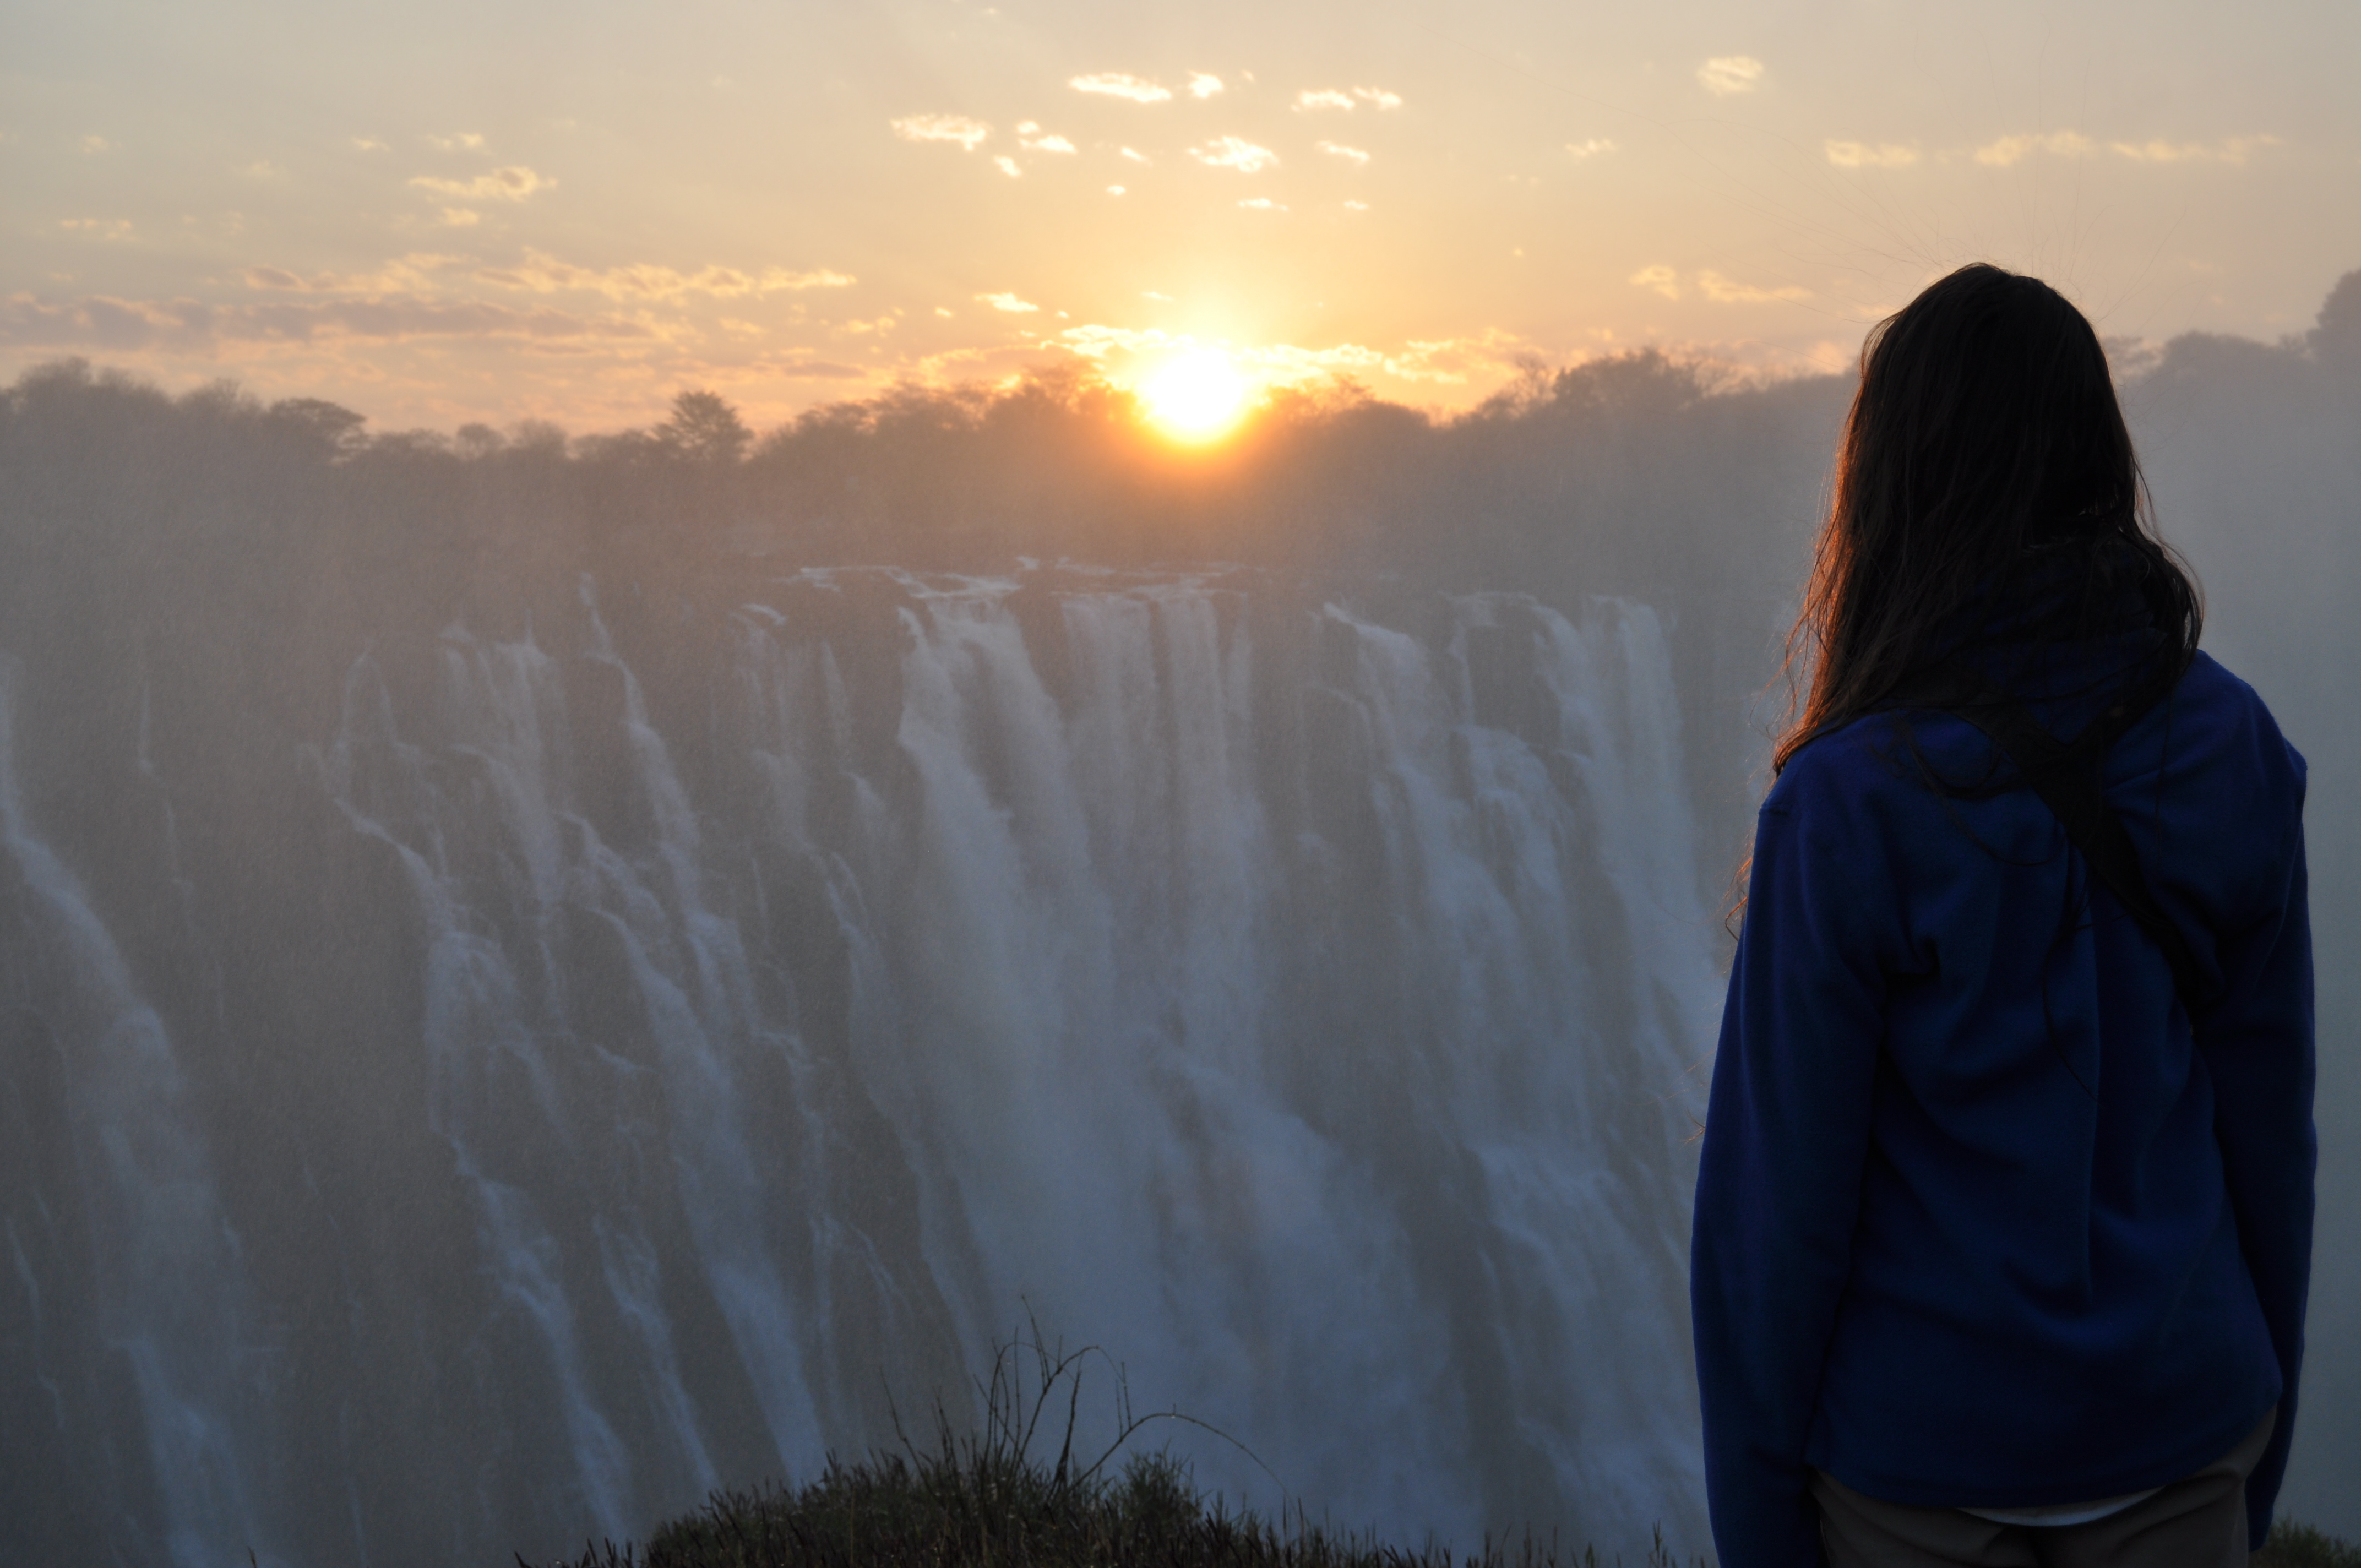 Lara-Scarlett Gervais devant les chutes Victoria